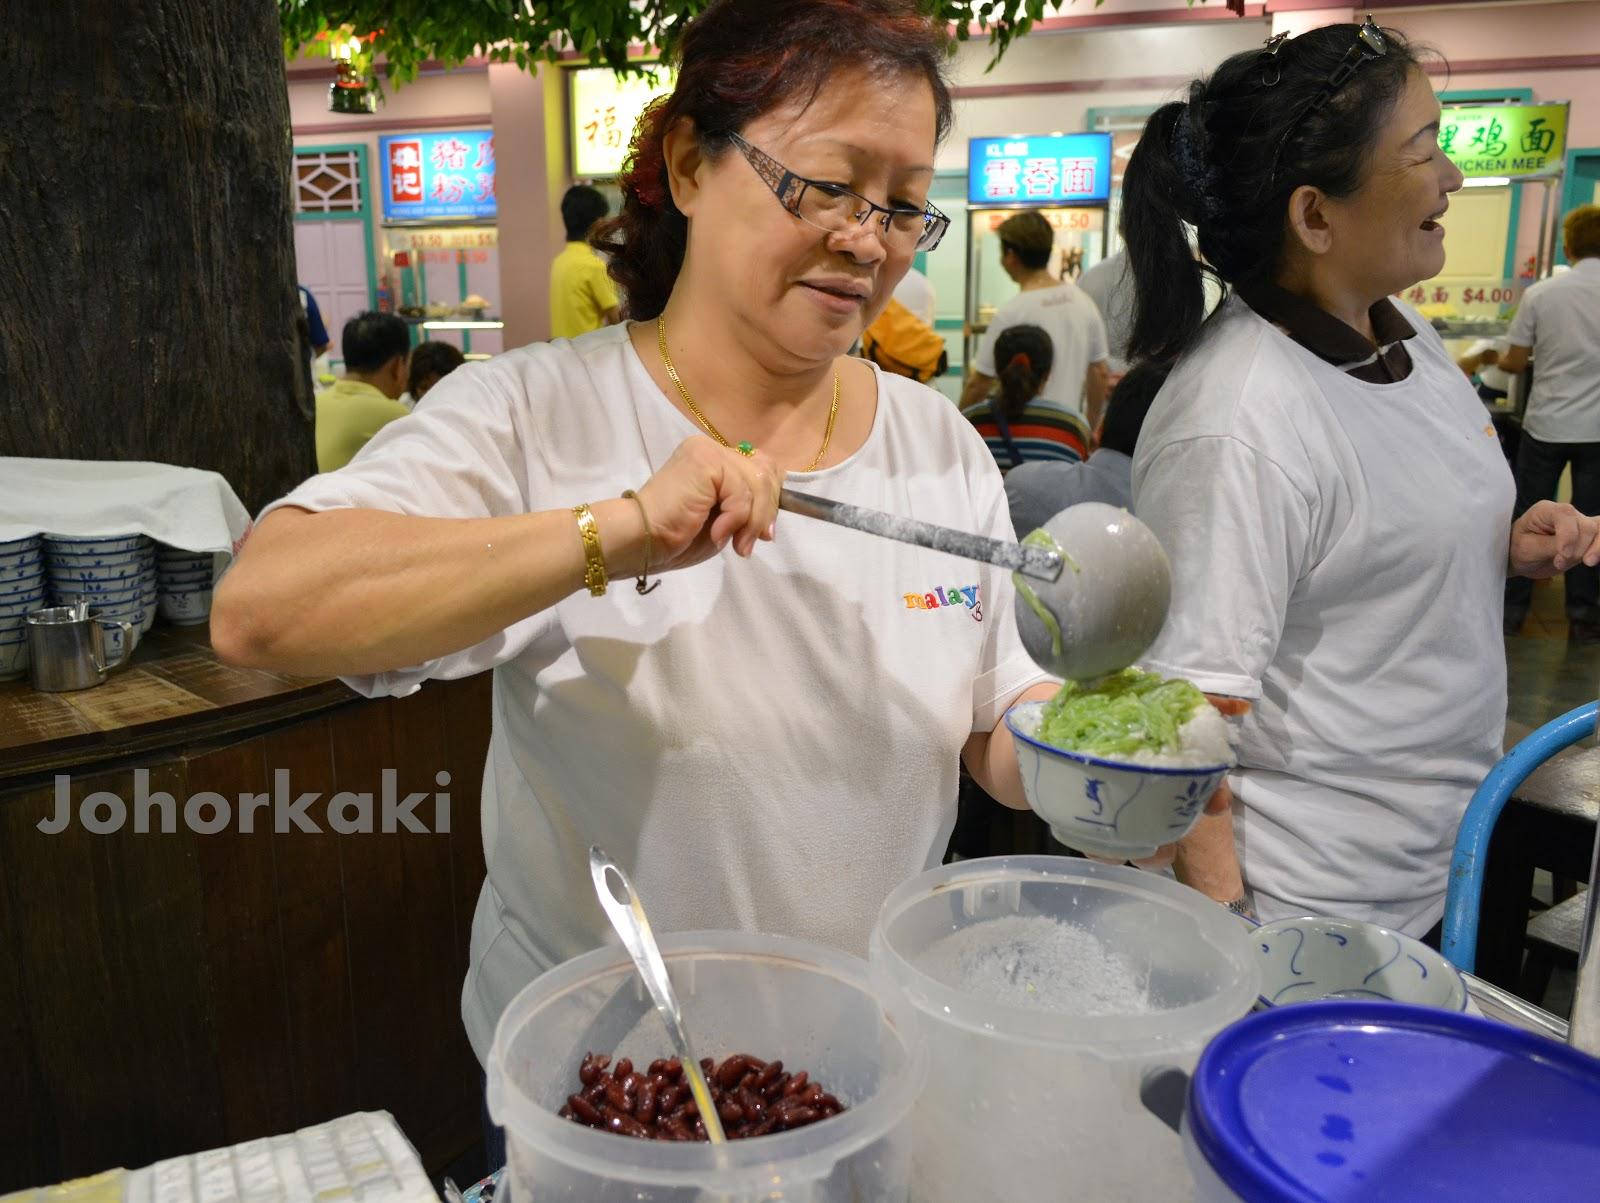 Bkk forex jurong point